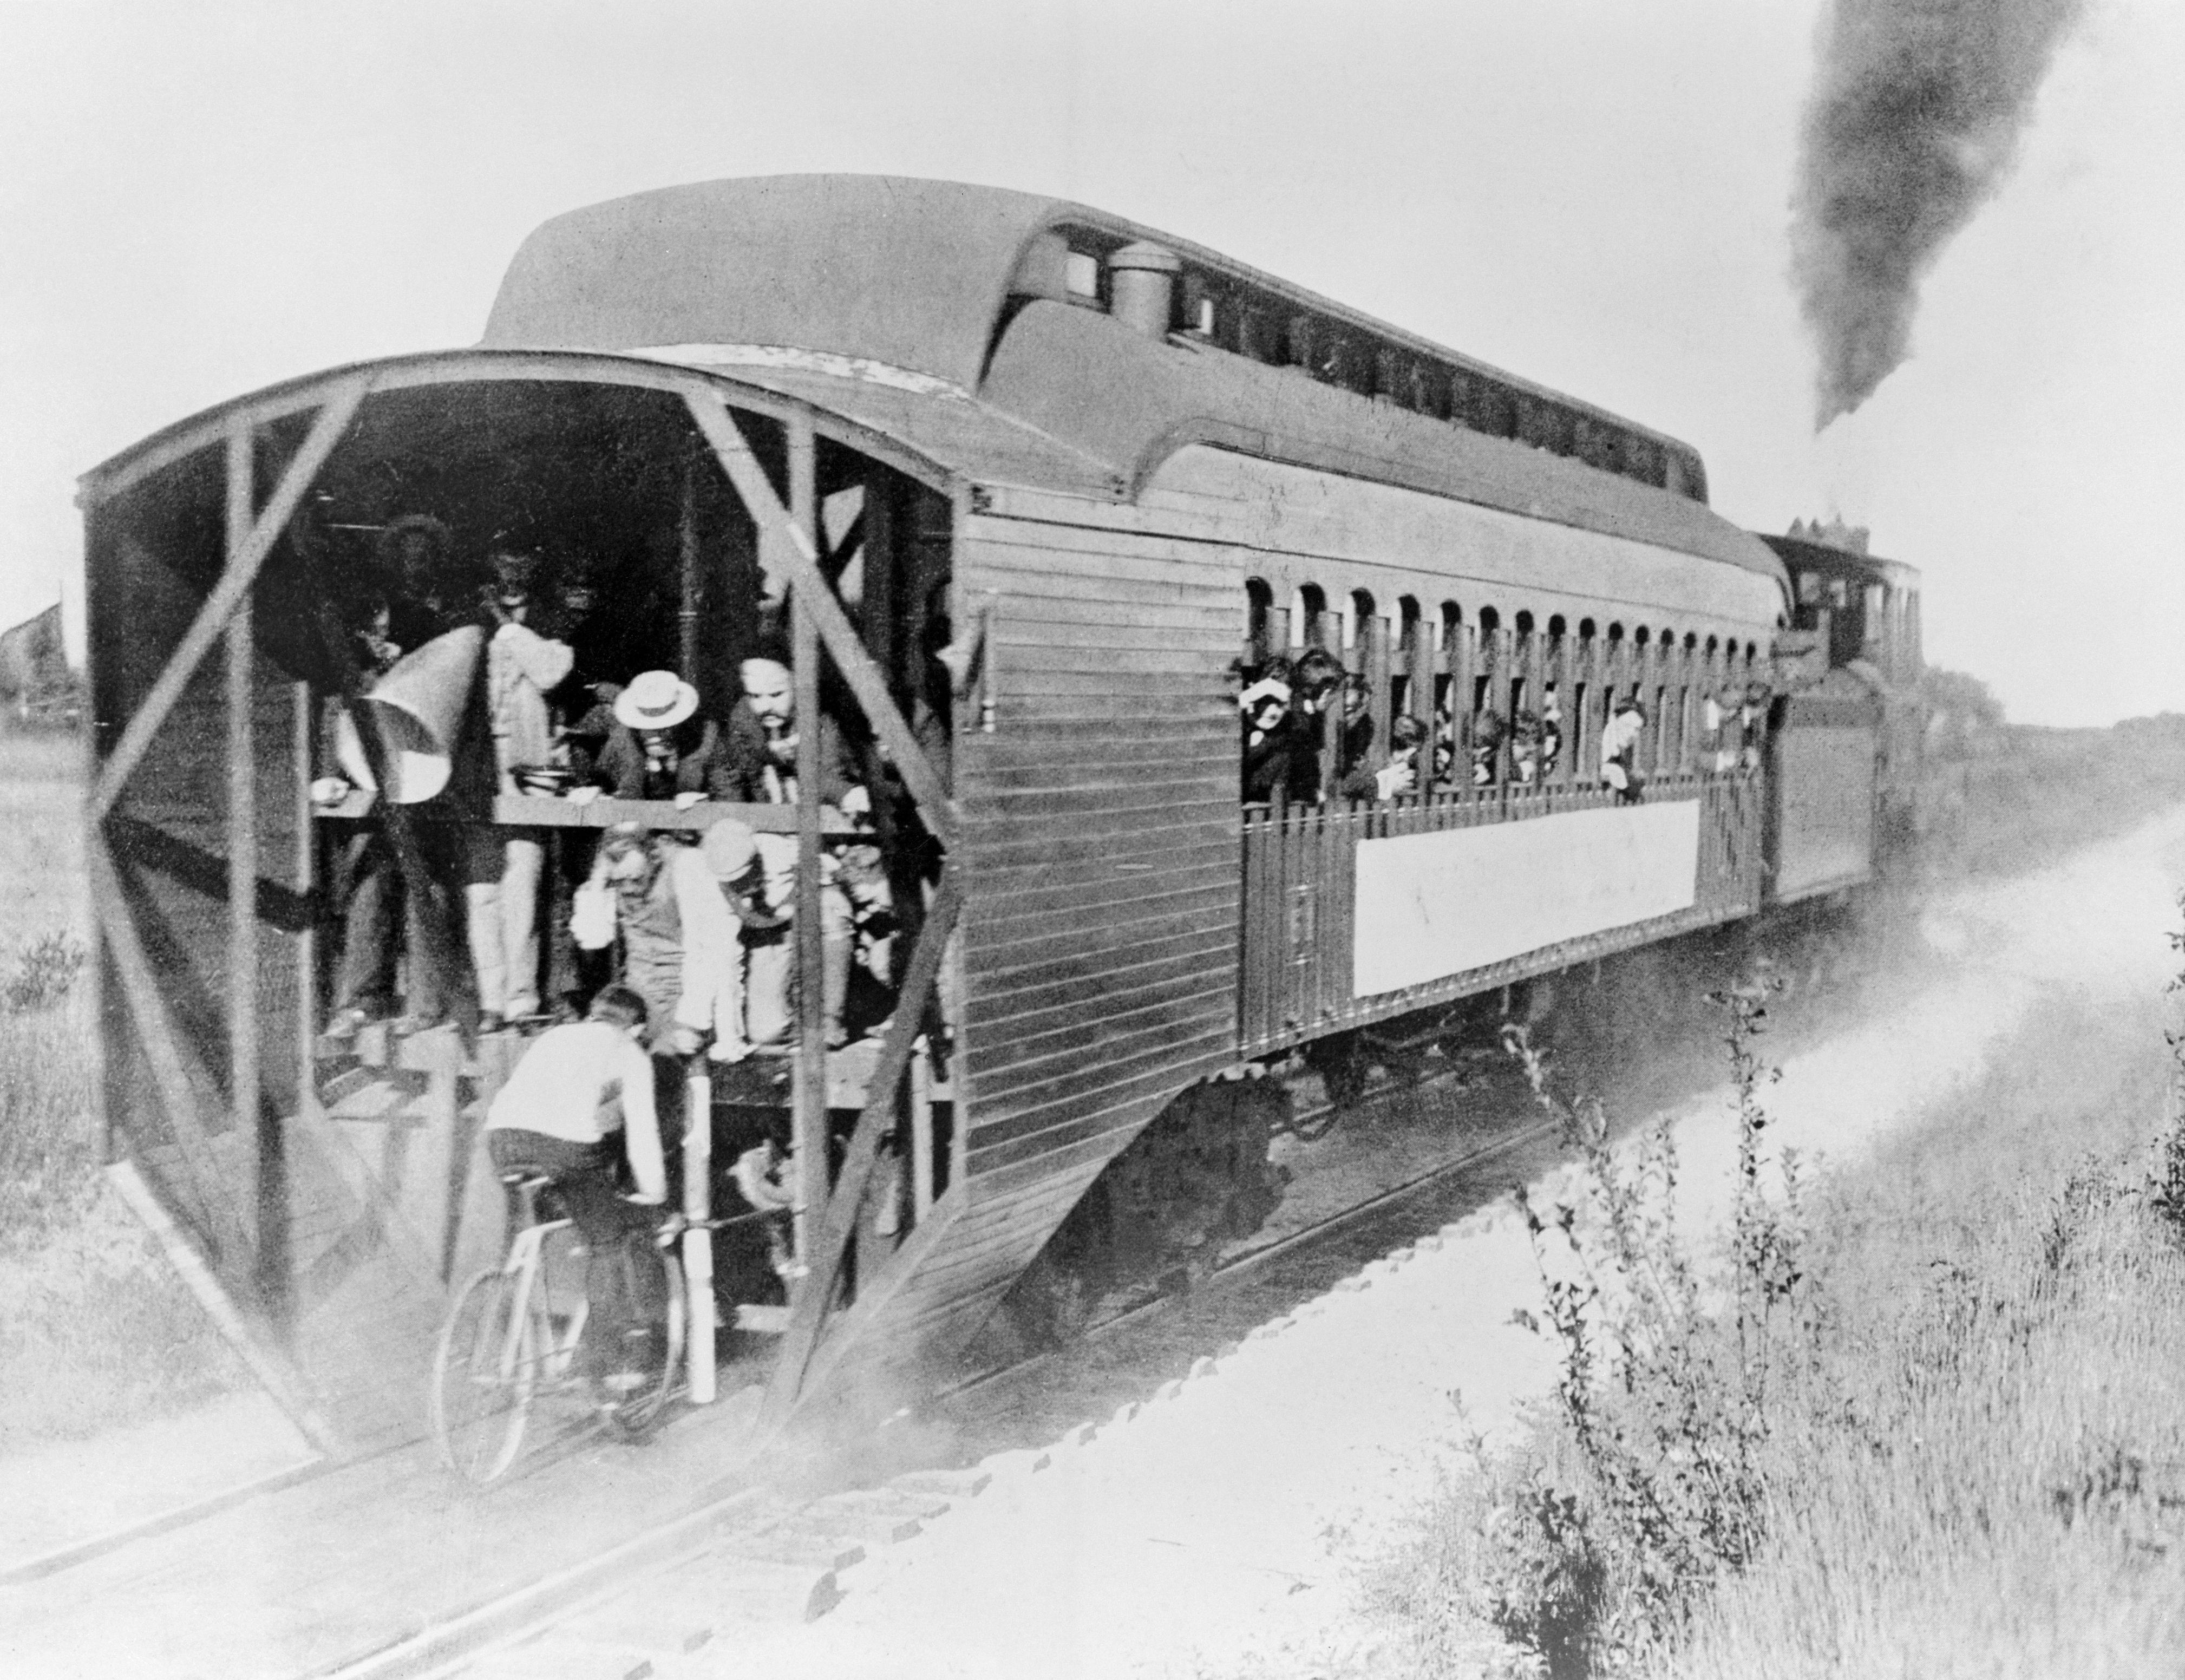 Bicycle Trailing Train